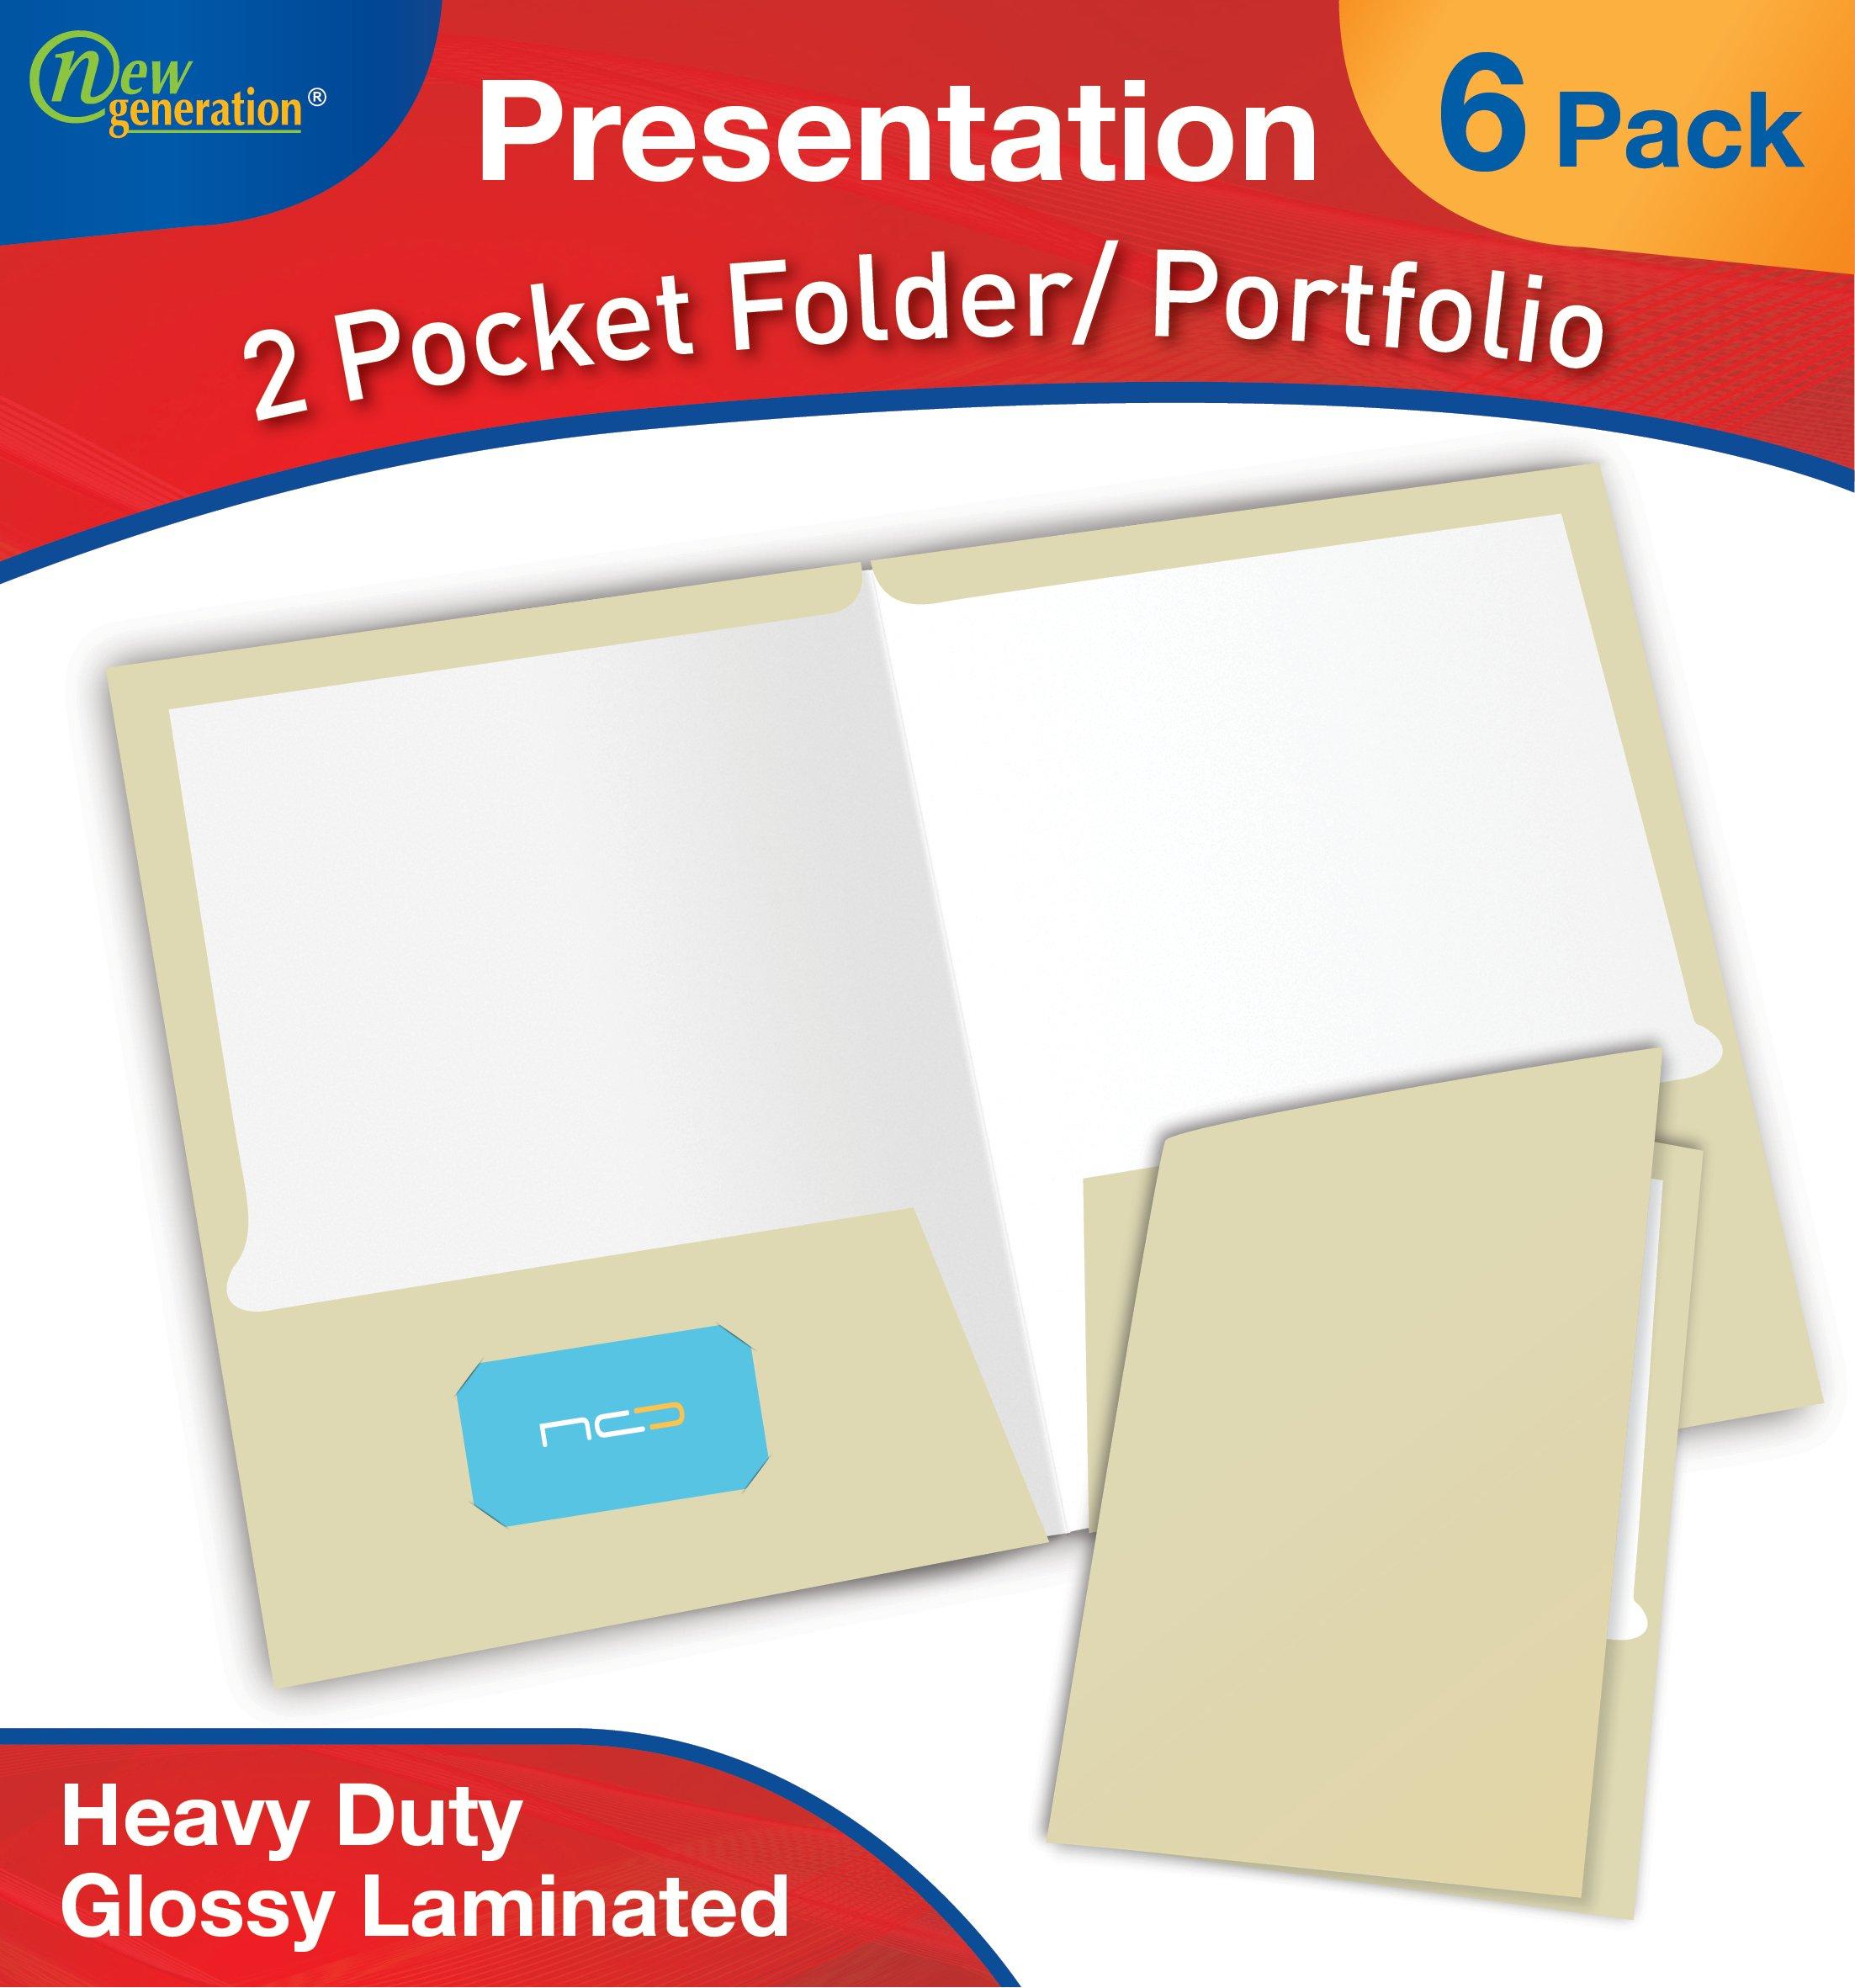 Buy new generation ivory 2 pocket folder durable heavy duty uv new generation ivory 2 pocket folder durable heavy duty uv glossy laminated business reheart Choice Image